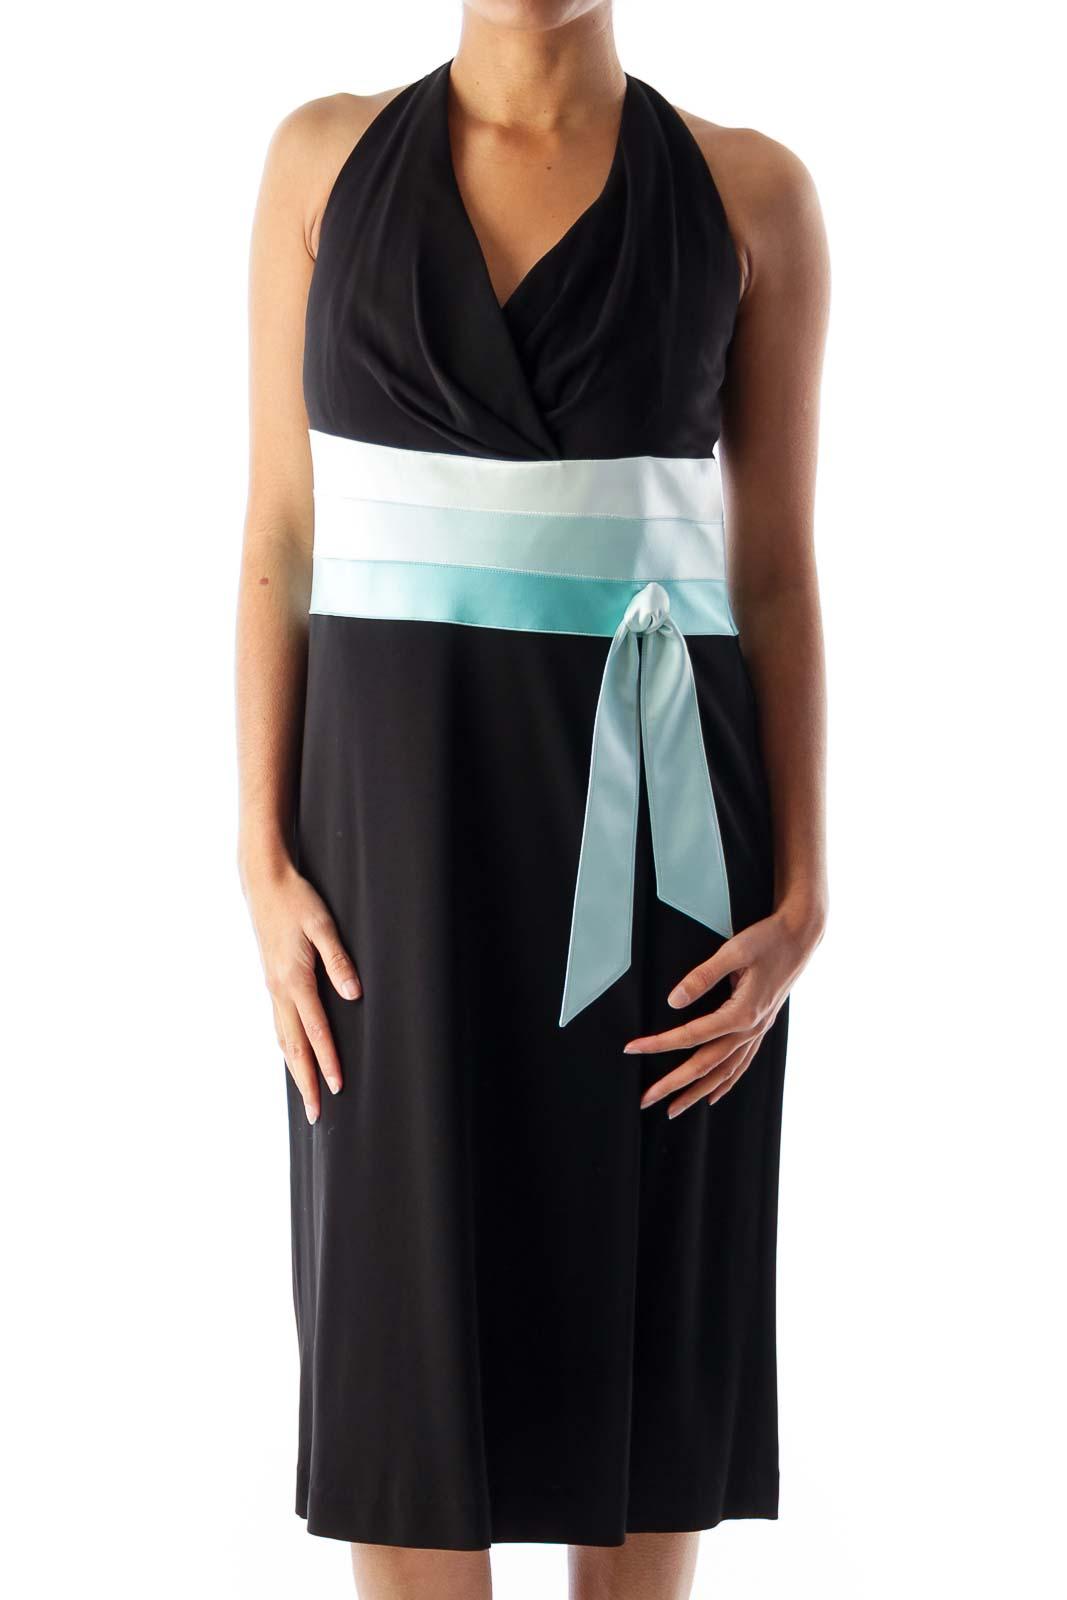 Black & Blue Color Block Dress